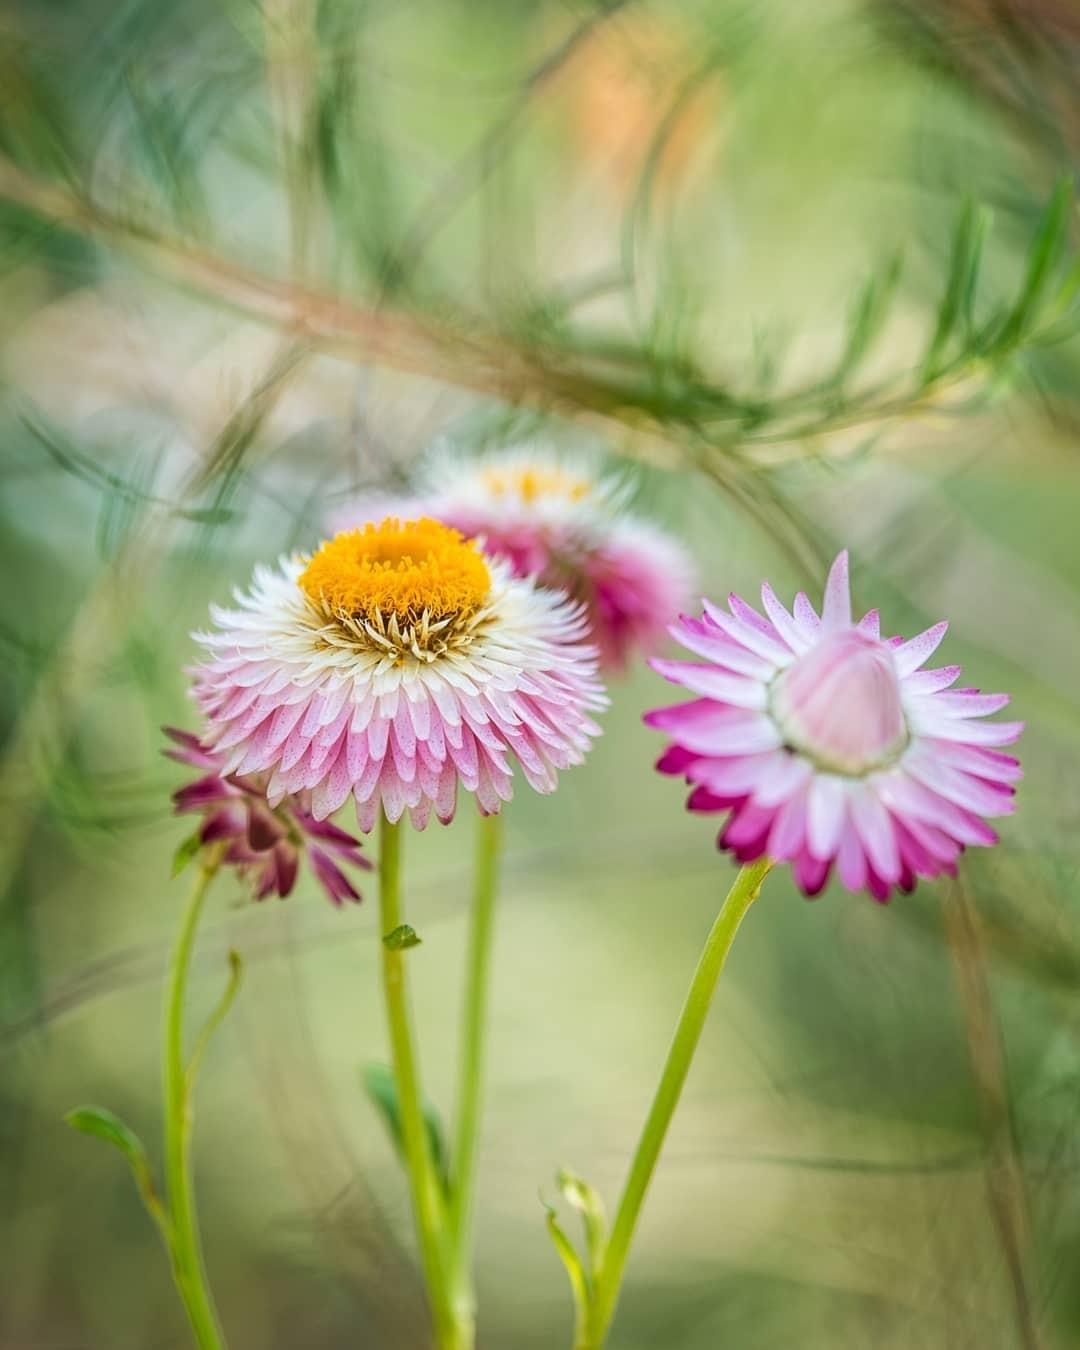 Everlasting Flower - Stunning Photo from Kew Gardens by Ines Stuart-Davidson